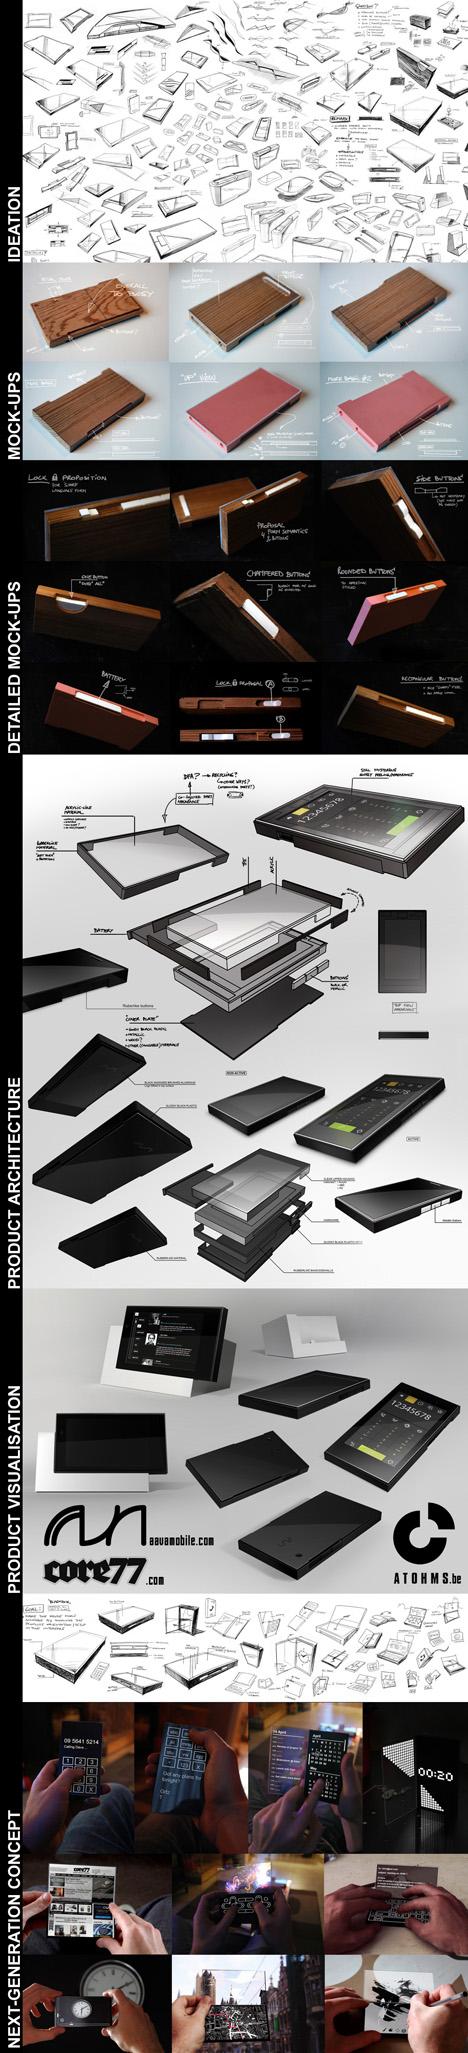 lampi_designproces.jpg